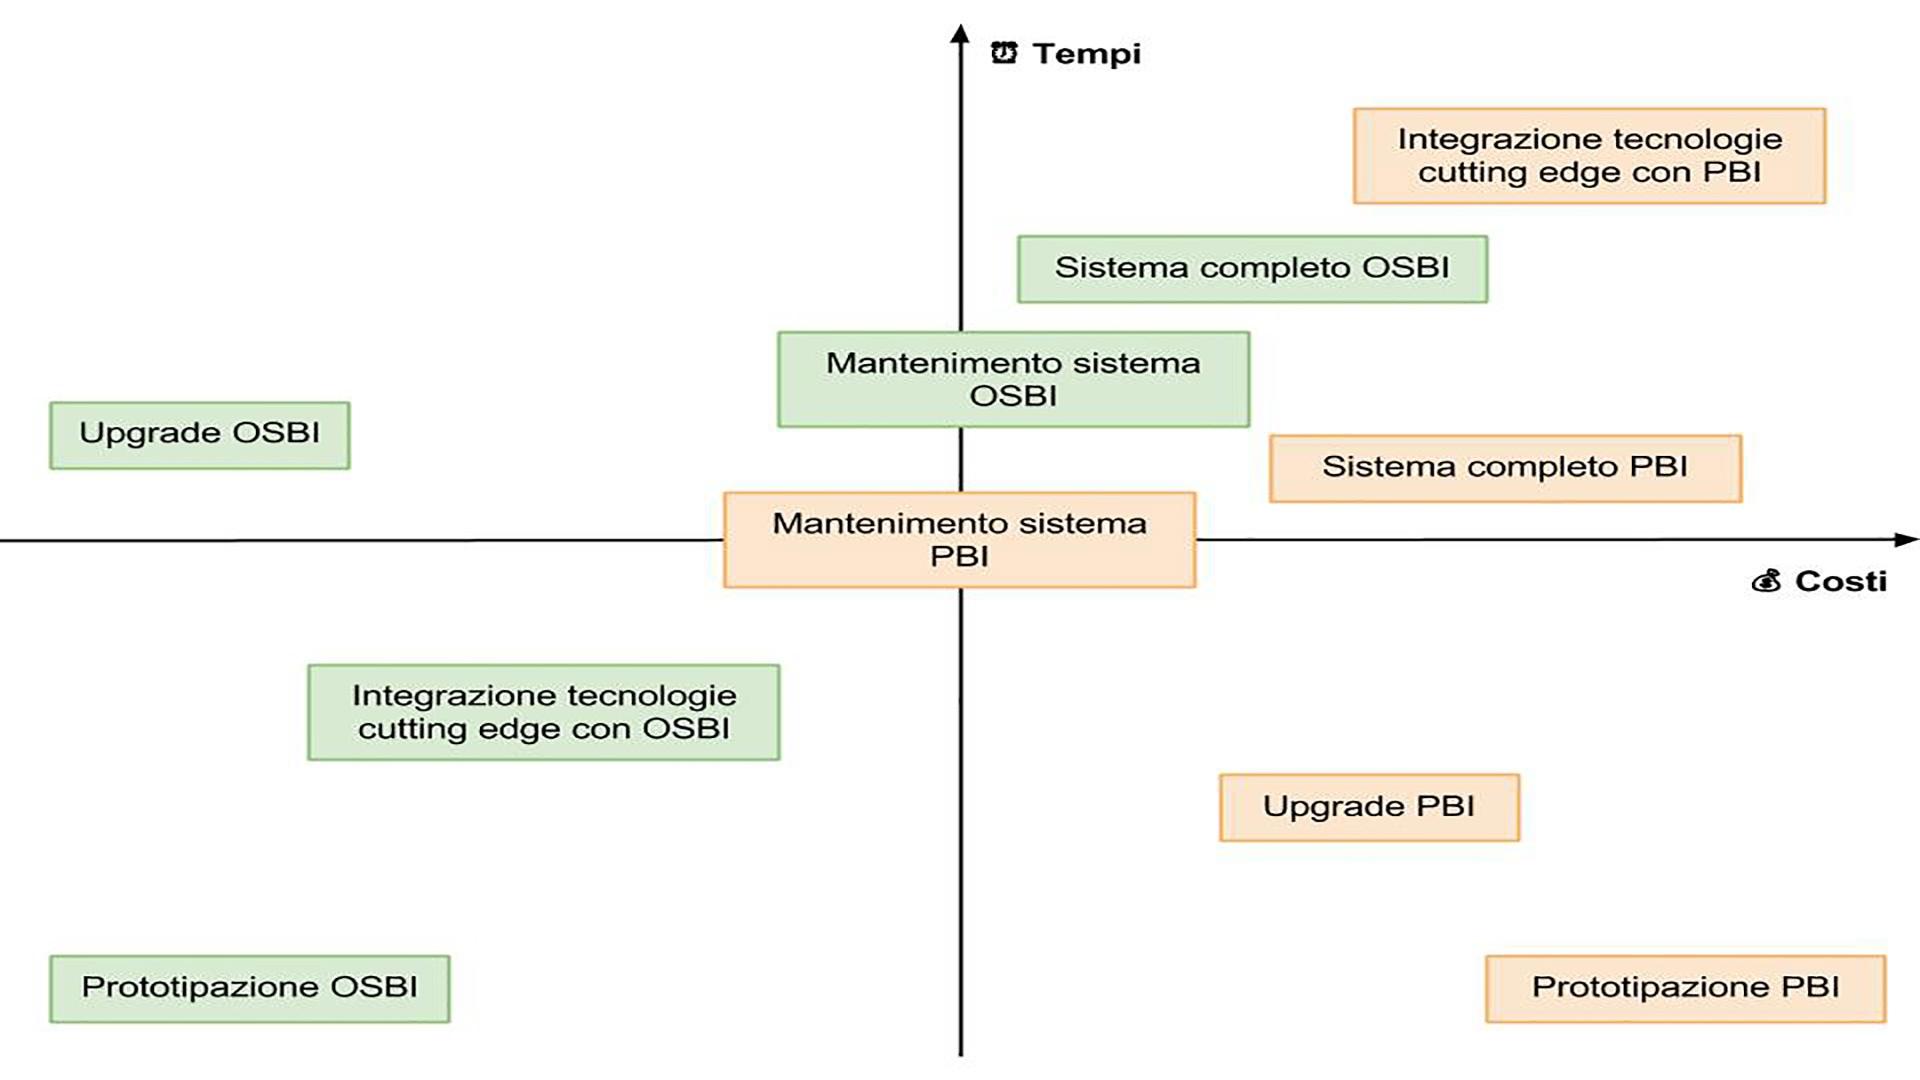 OSBI Vs PBI - Times and costs_optm.jpg